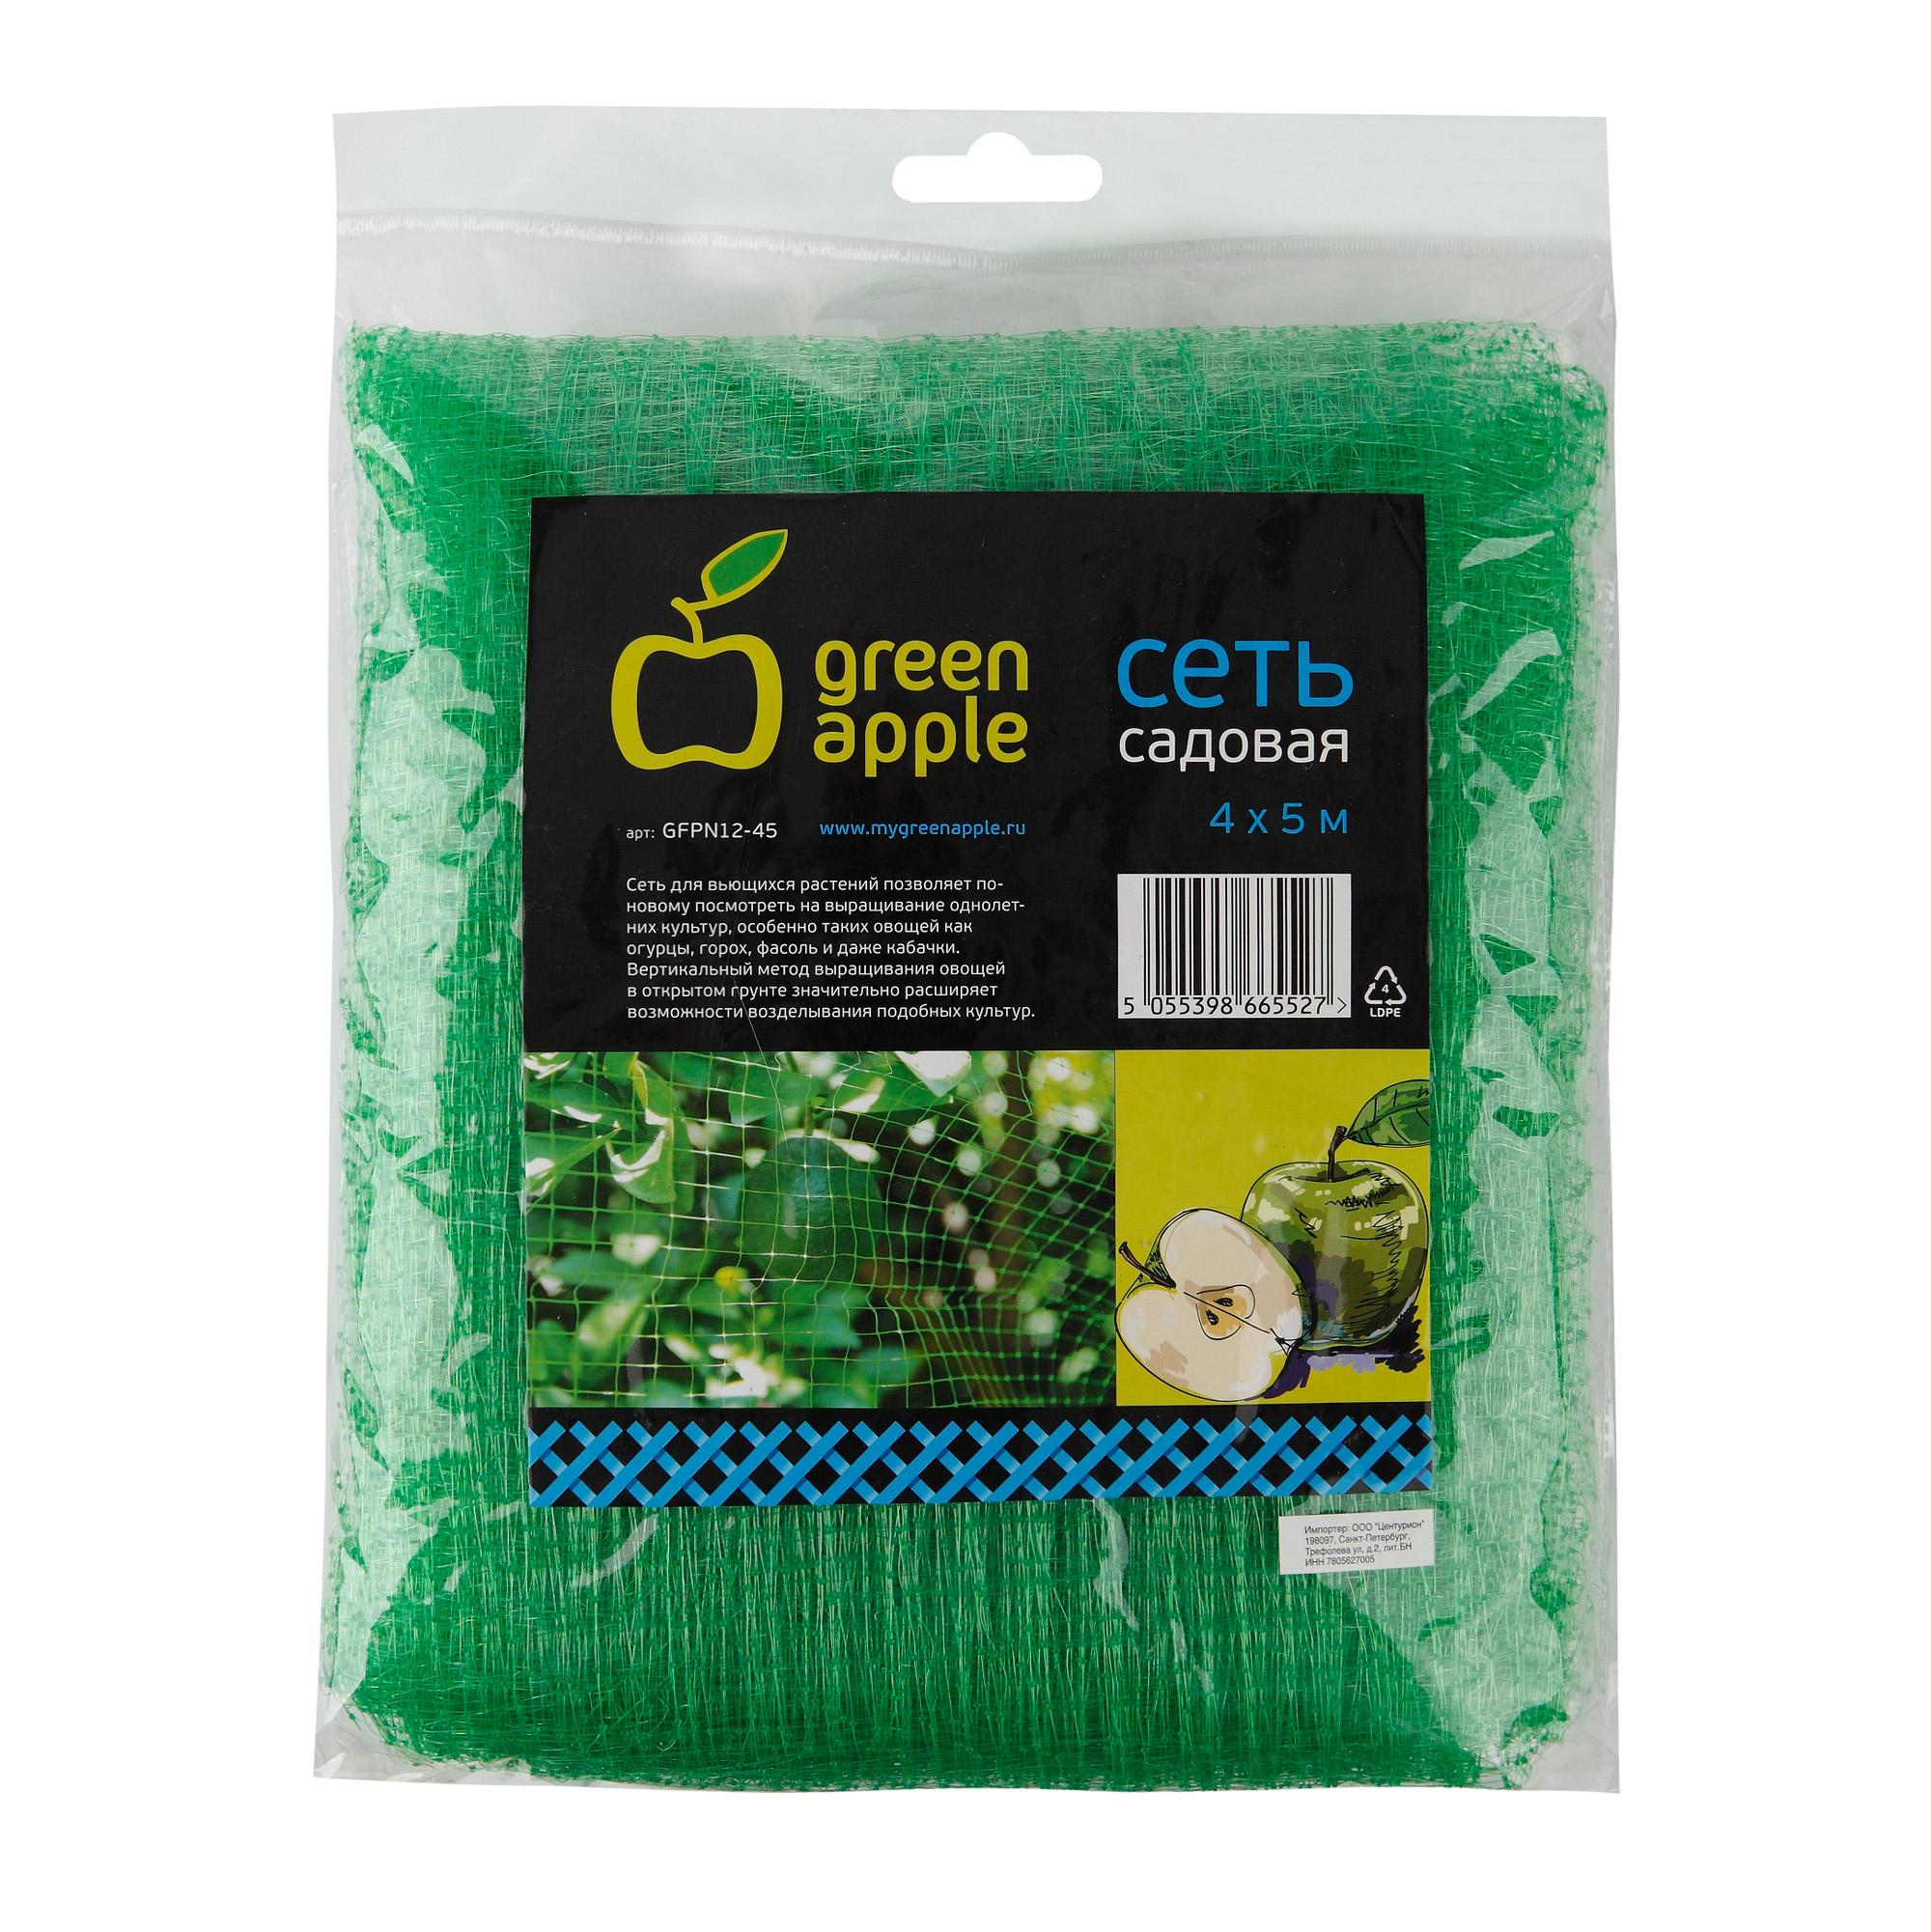 Сеть садовая Green apple GFPN12-45 4х5 м фигурка садовая green apple бегемотик 34 х 16 3 х 20 см